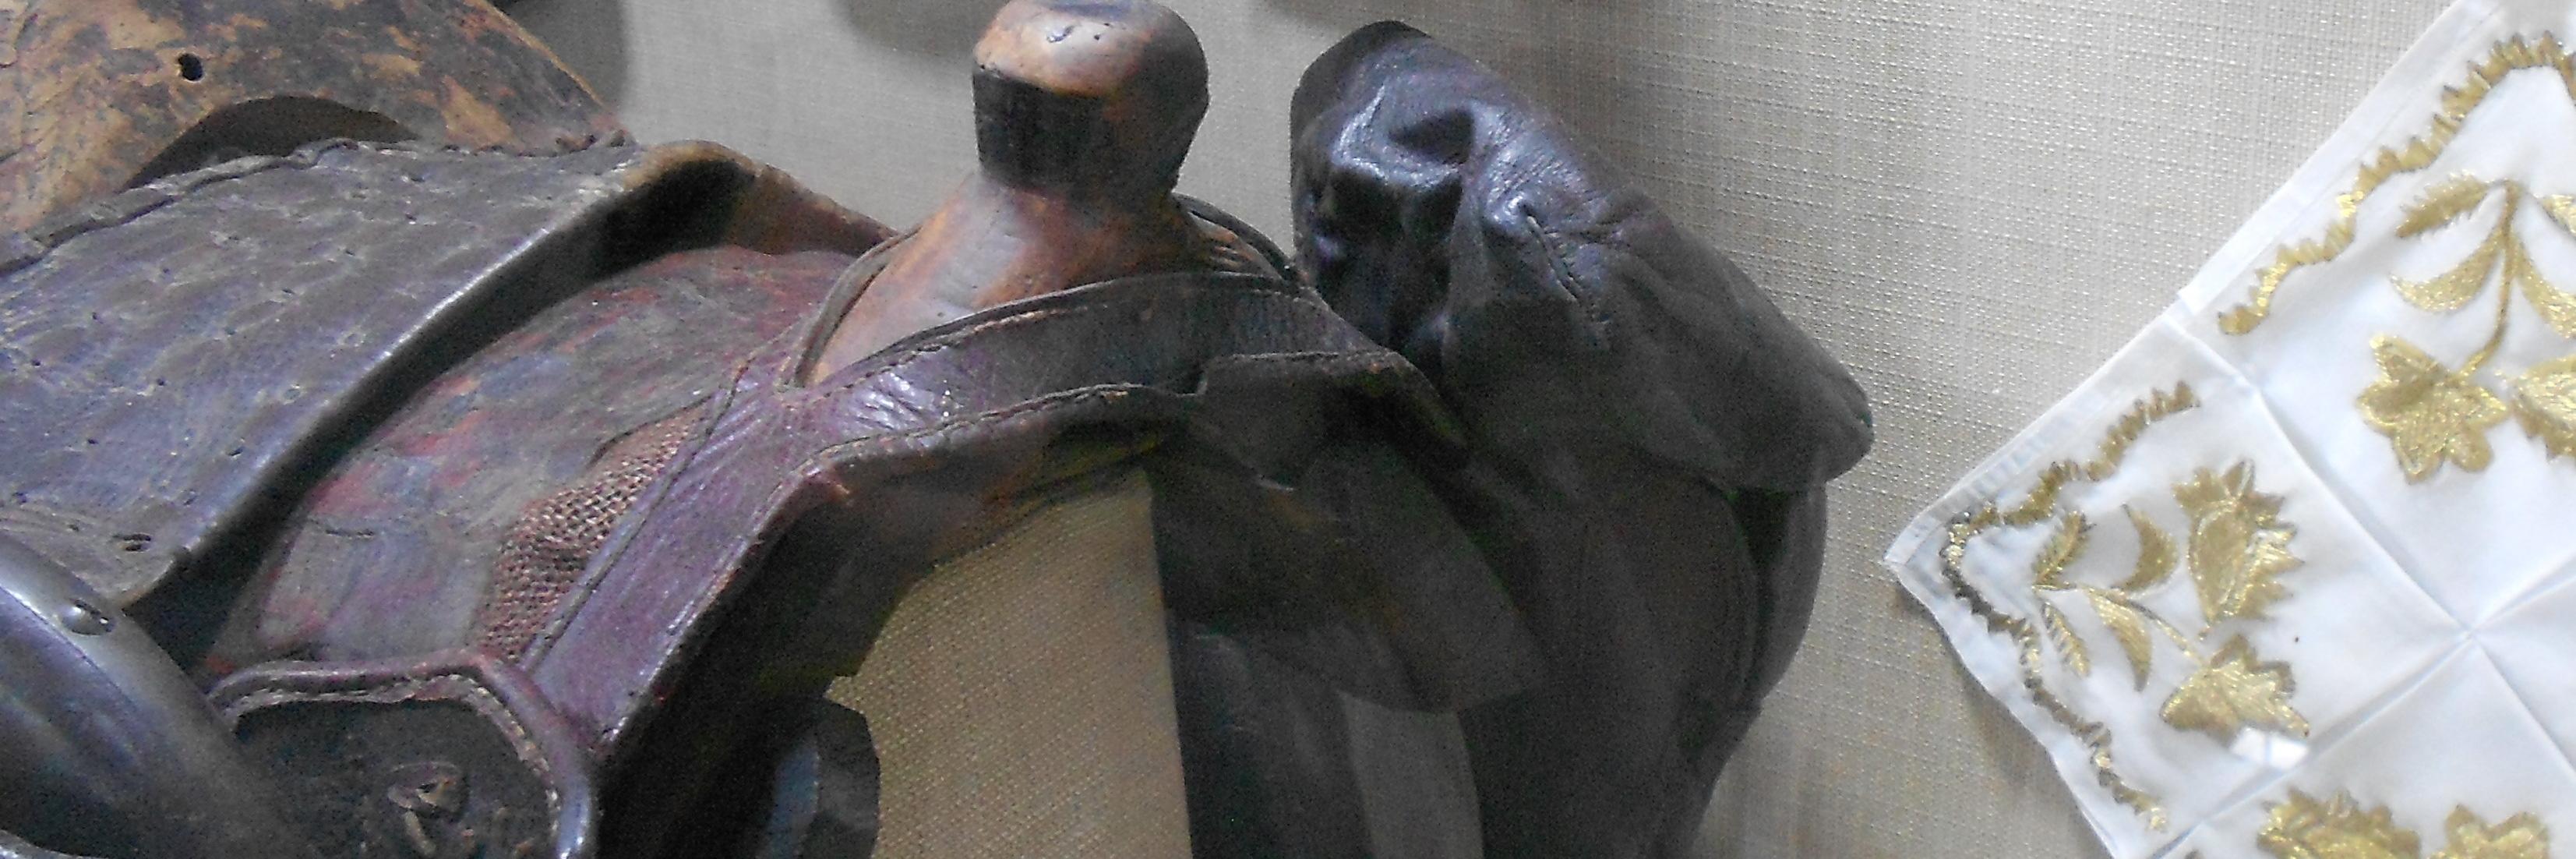 Сарач или седельщик. Фото: Елена Арсениевич, CC BY-SA 3.0